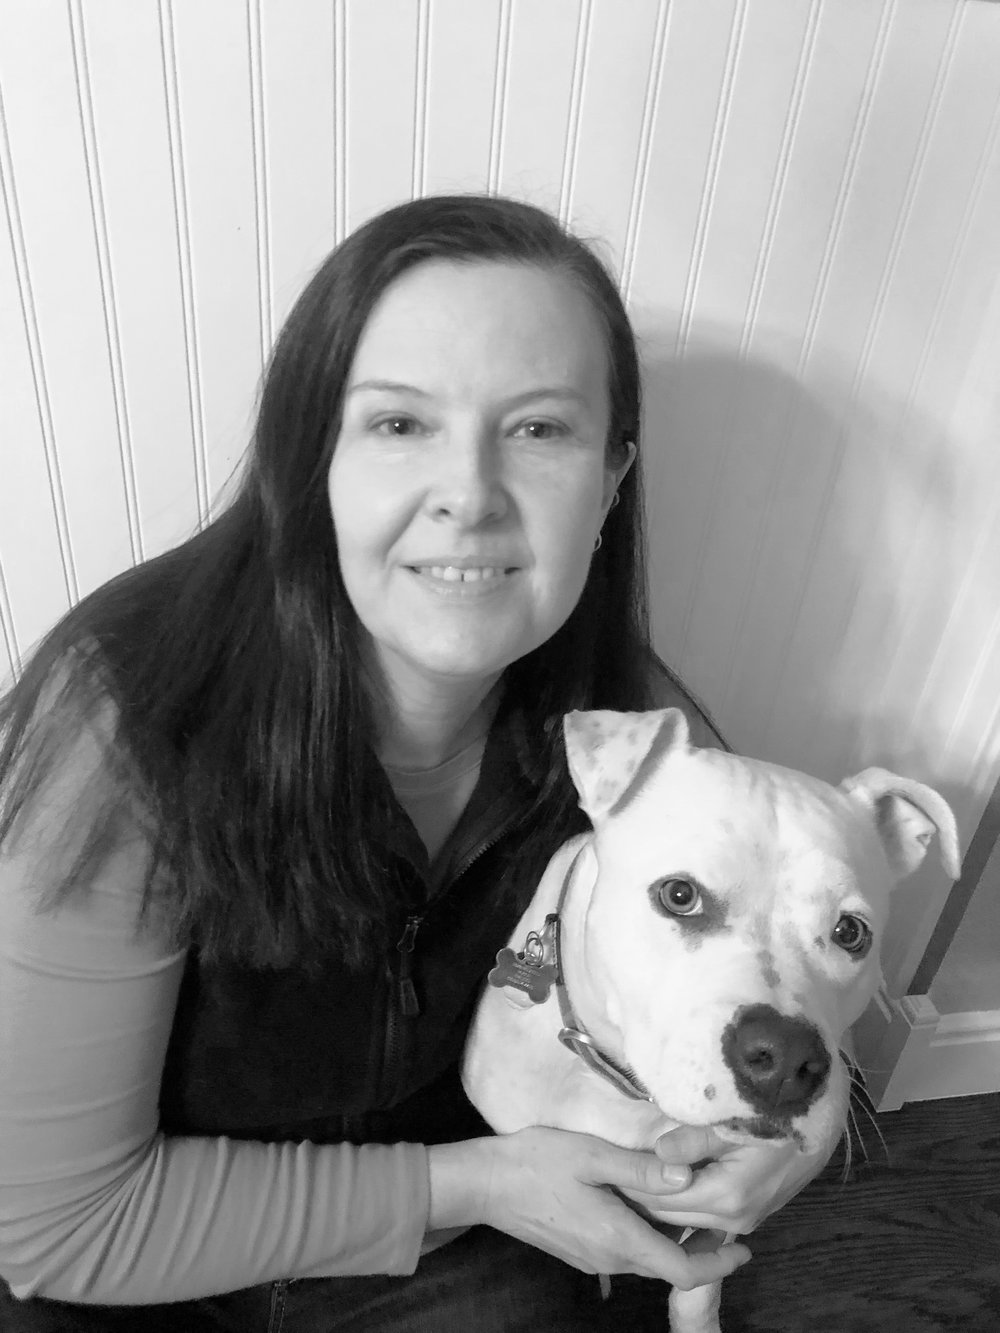 Susan, Certified Veterinary Technician